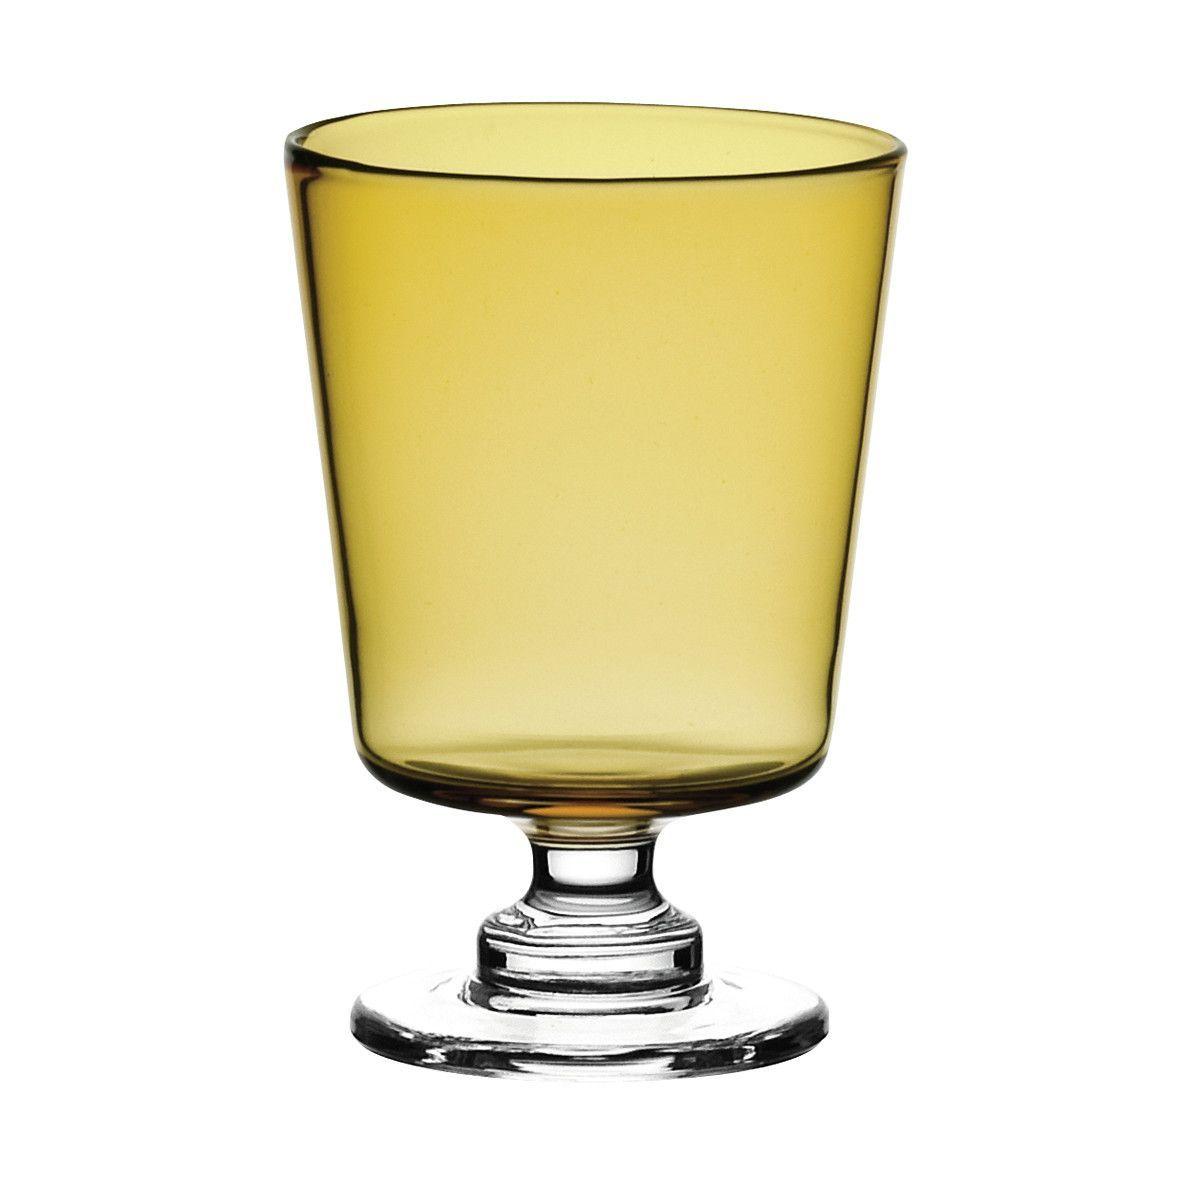 Sinfonia 12.5 Oz. Glass Water Goblet